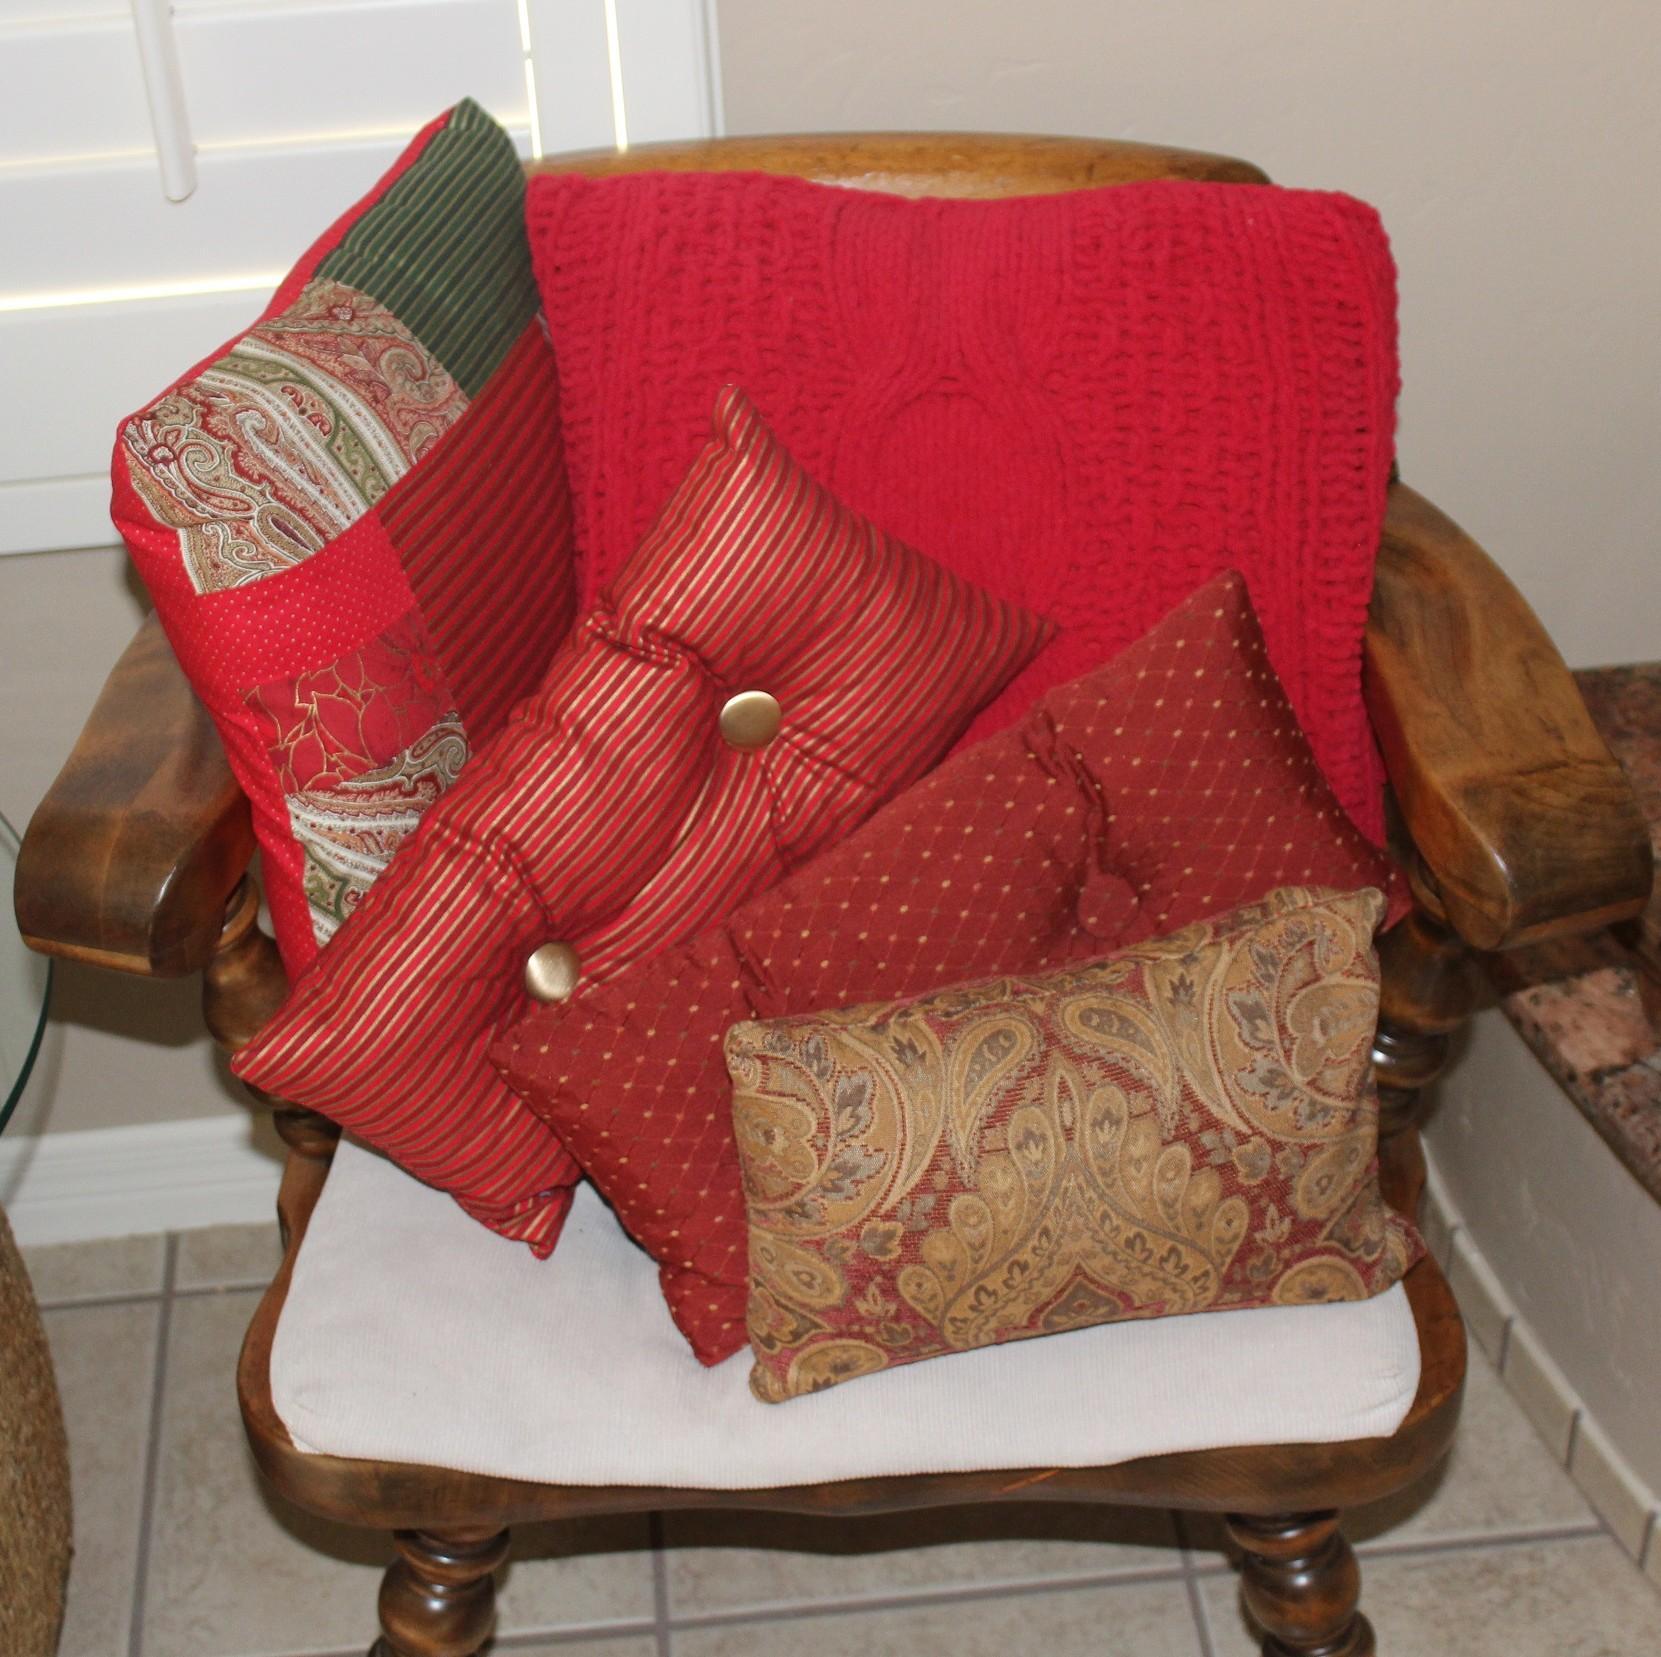 Judys_Christmas_Pillows.jpg